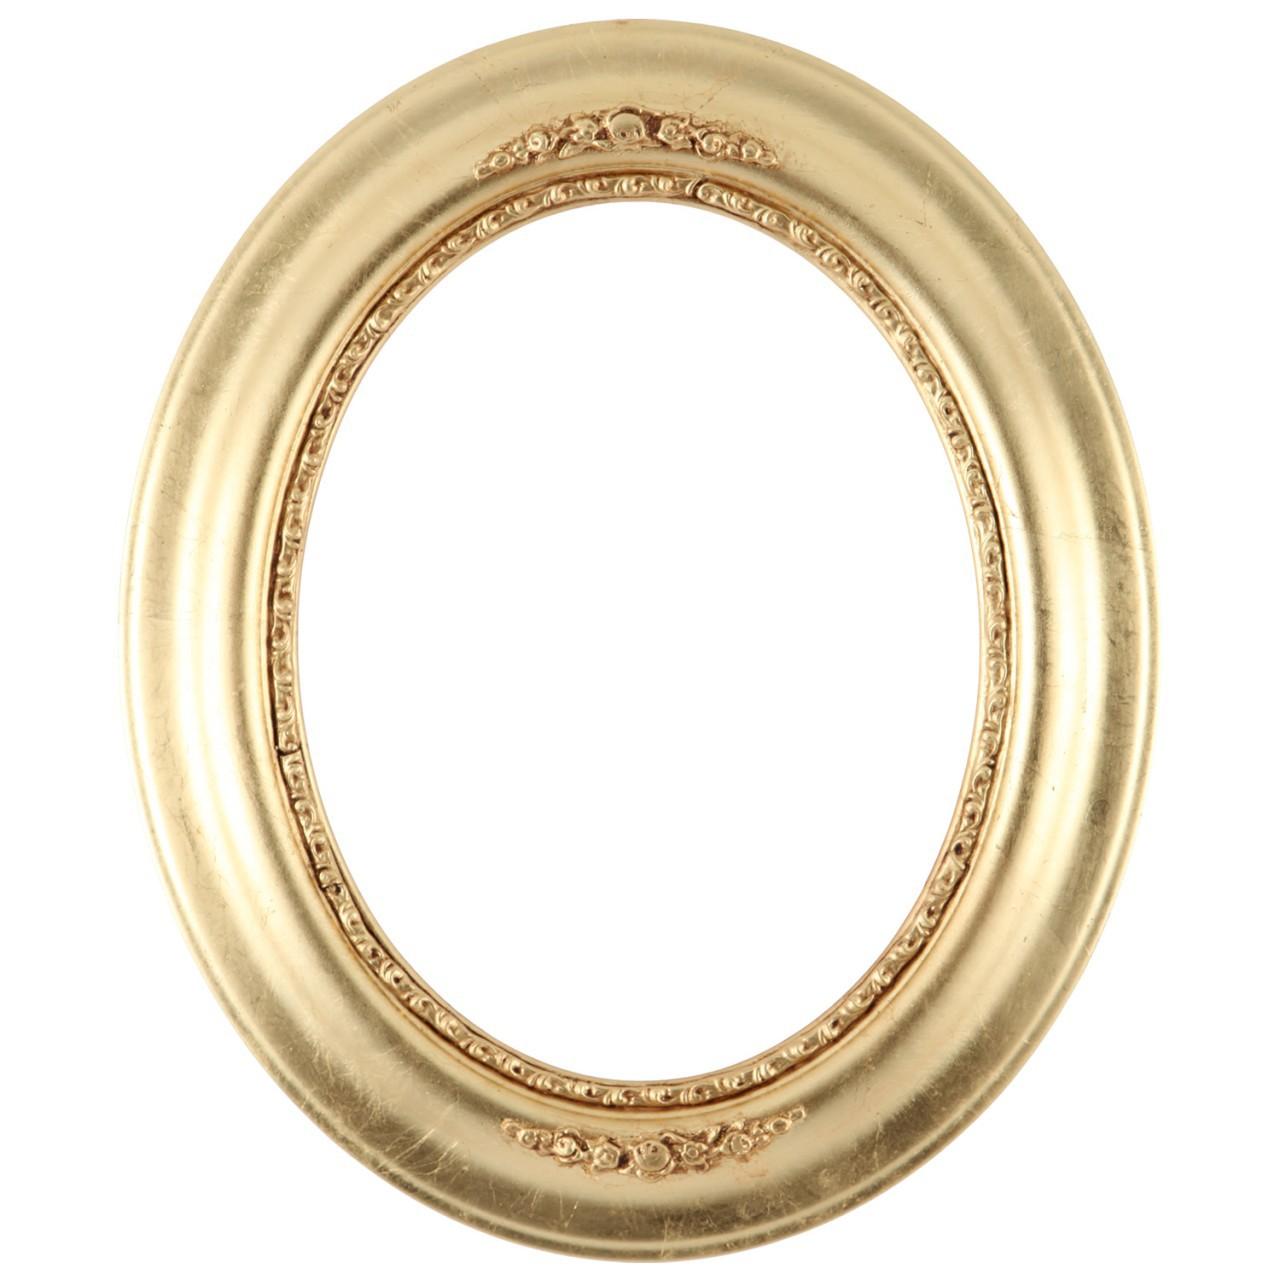 15 psd gold oval metal frames images gold picture frame